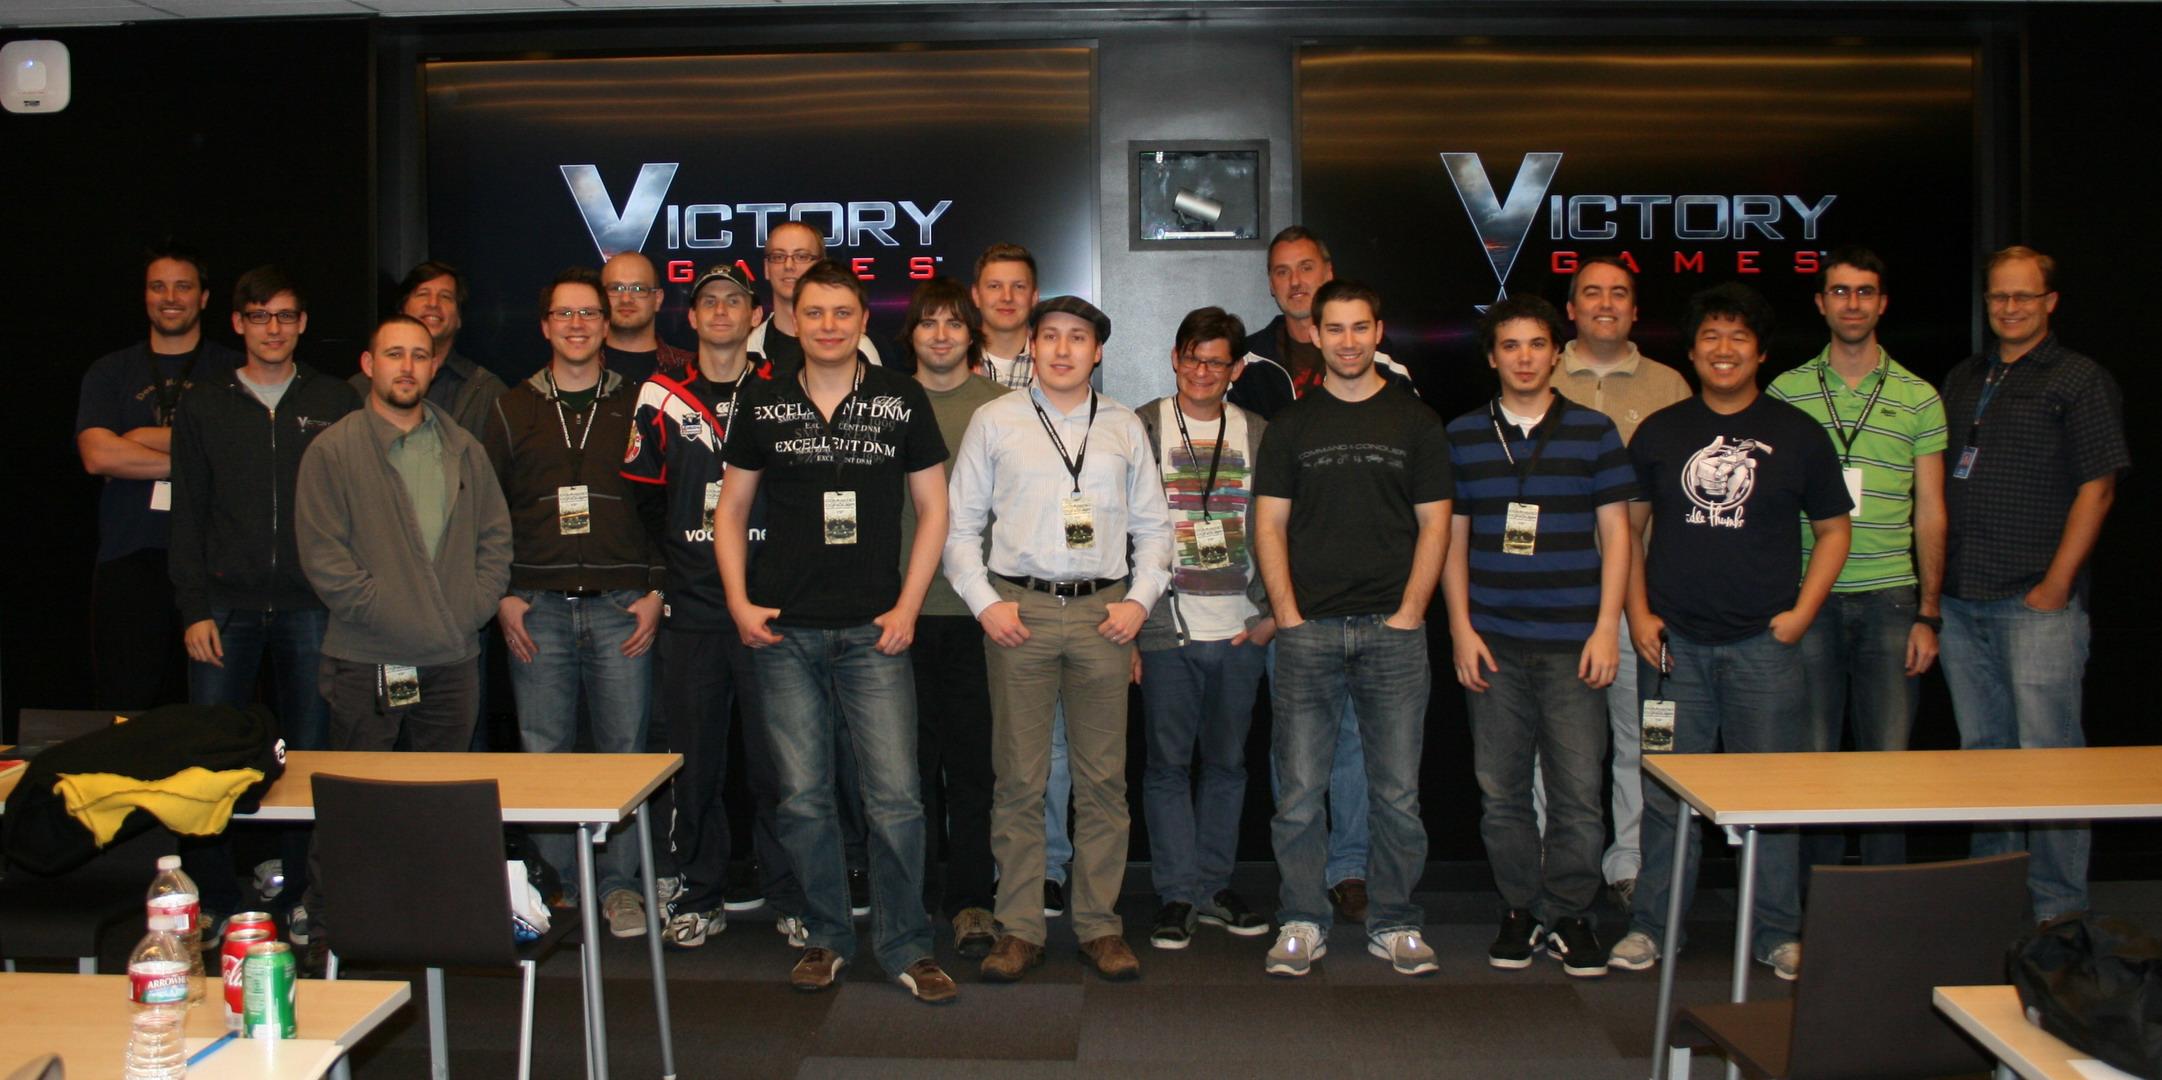 Command & Conquer Community Summit 2012